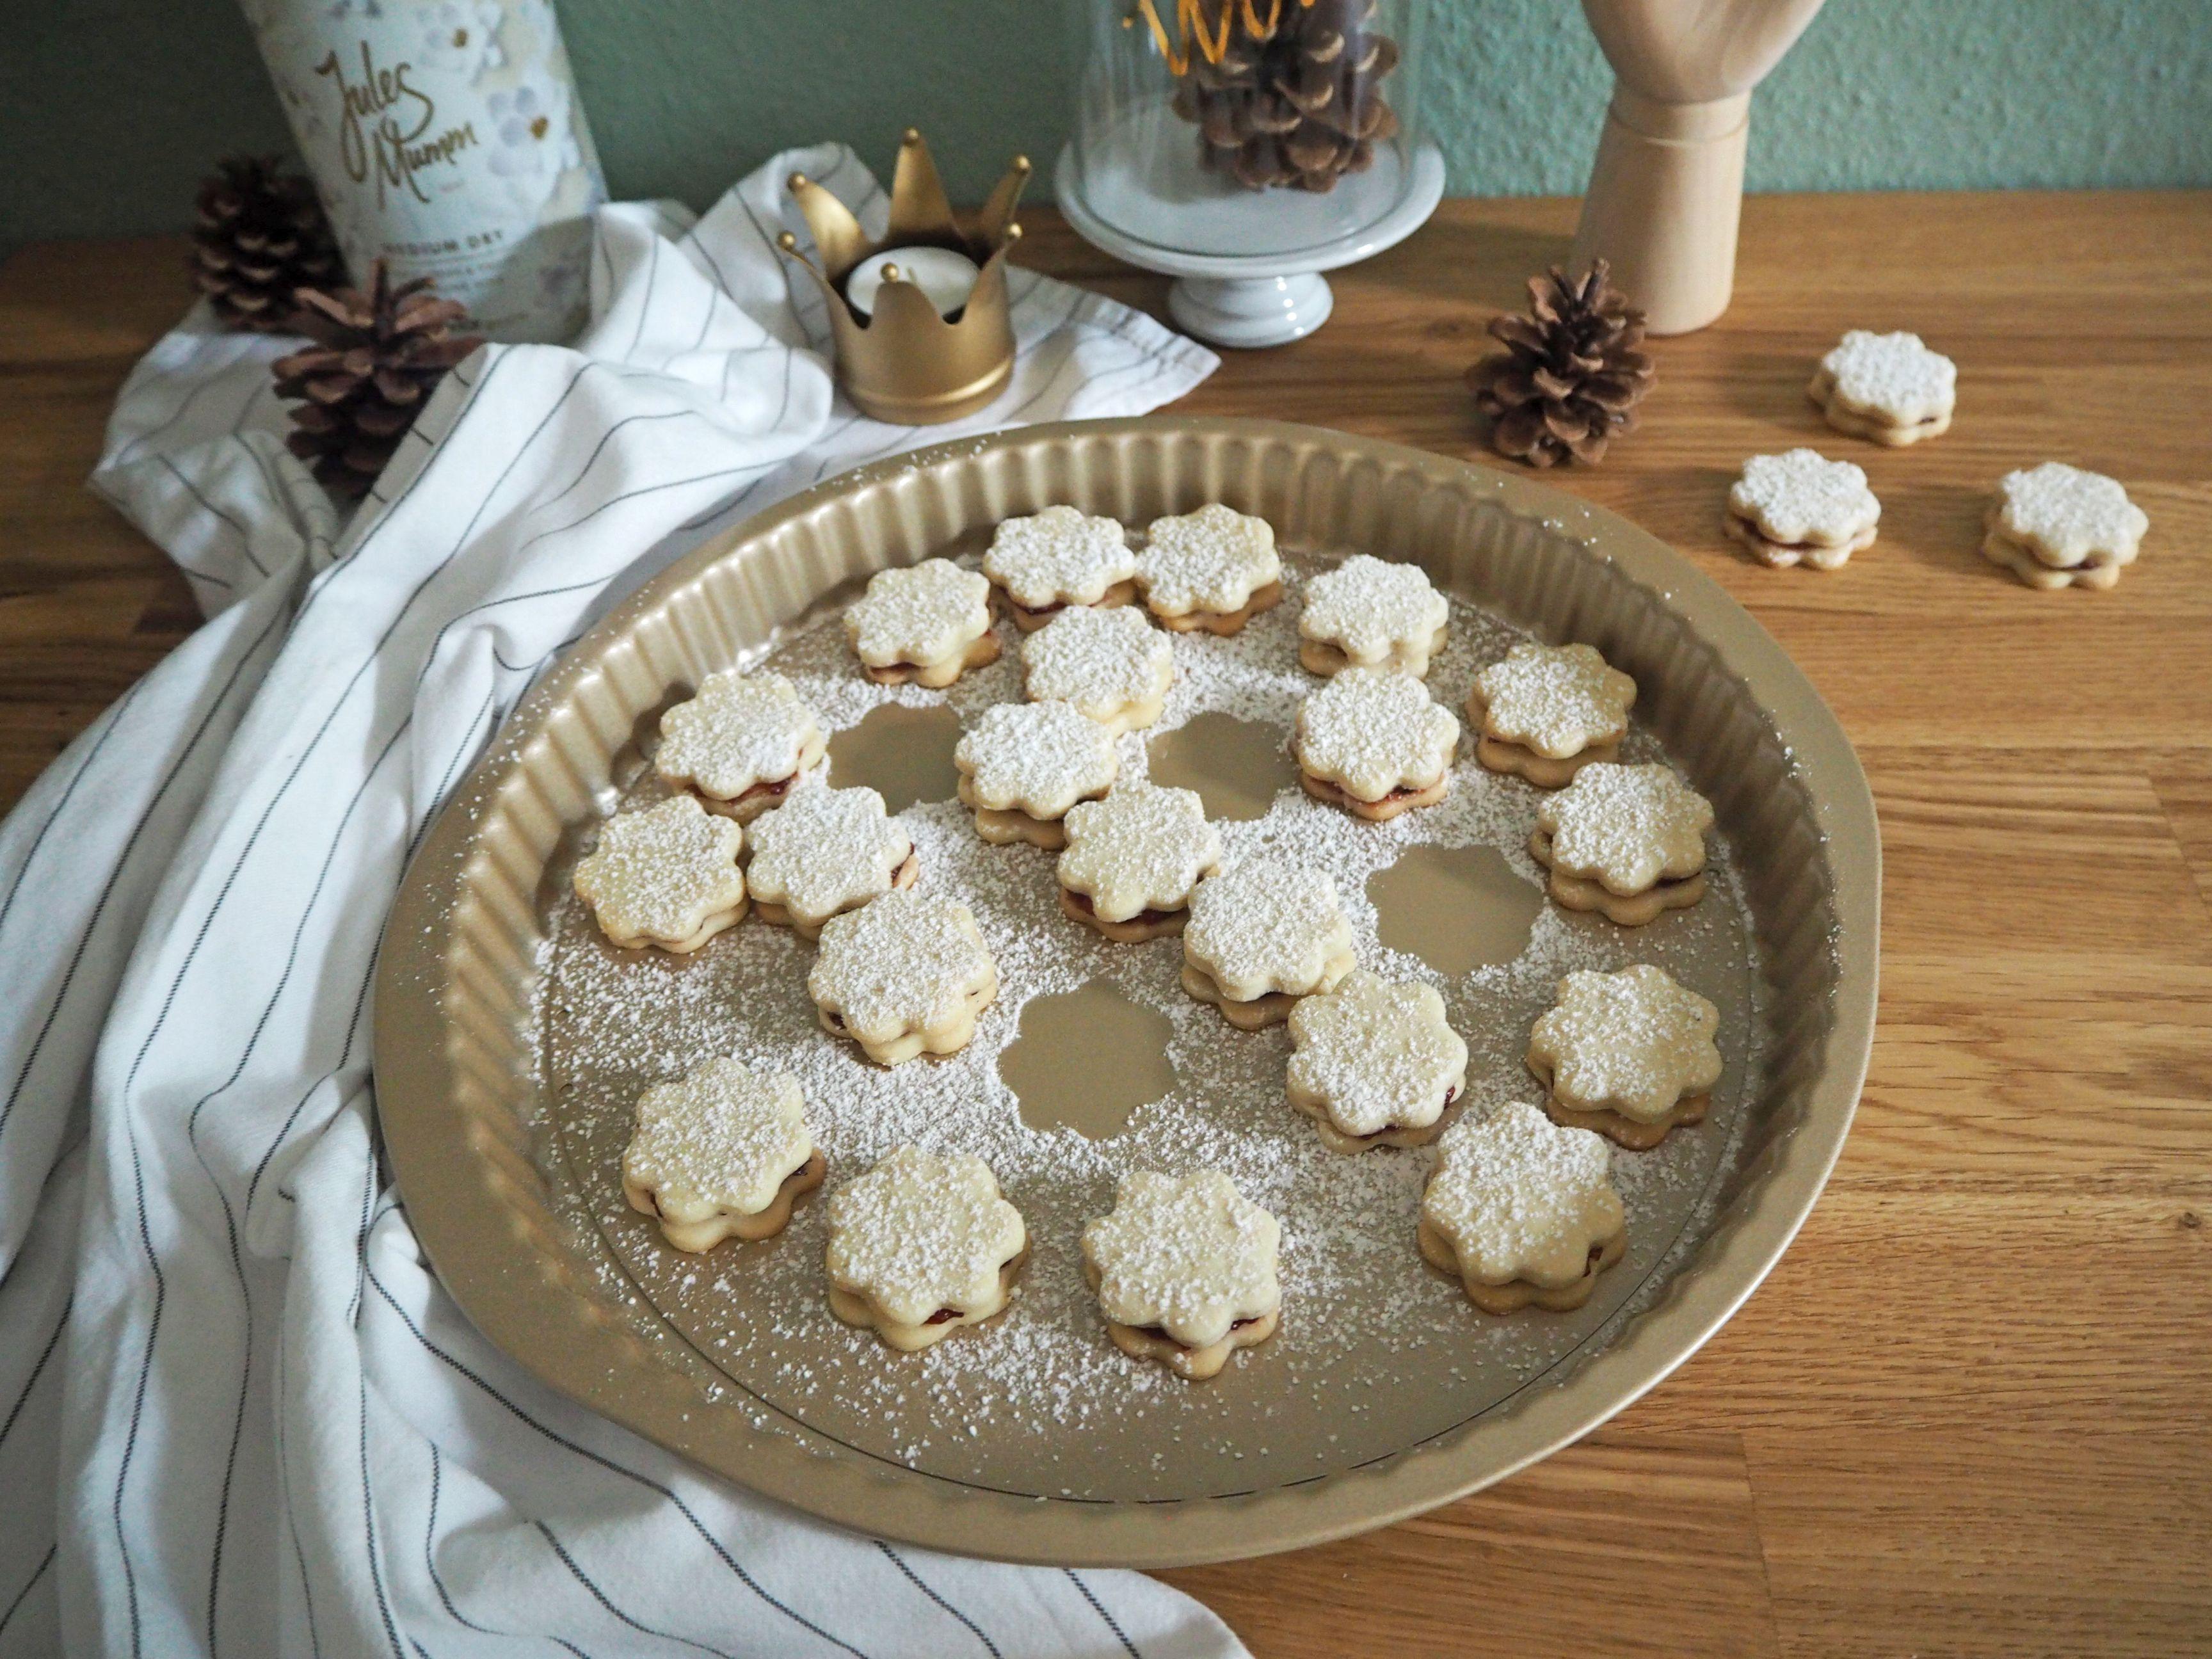 2018-skoen-och-kreativ-food-god-jul-plaetzchen-vanille-cookies-mit-marmelade (2)